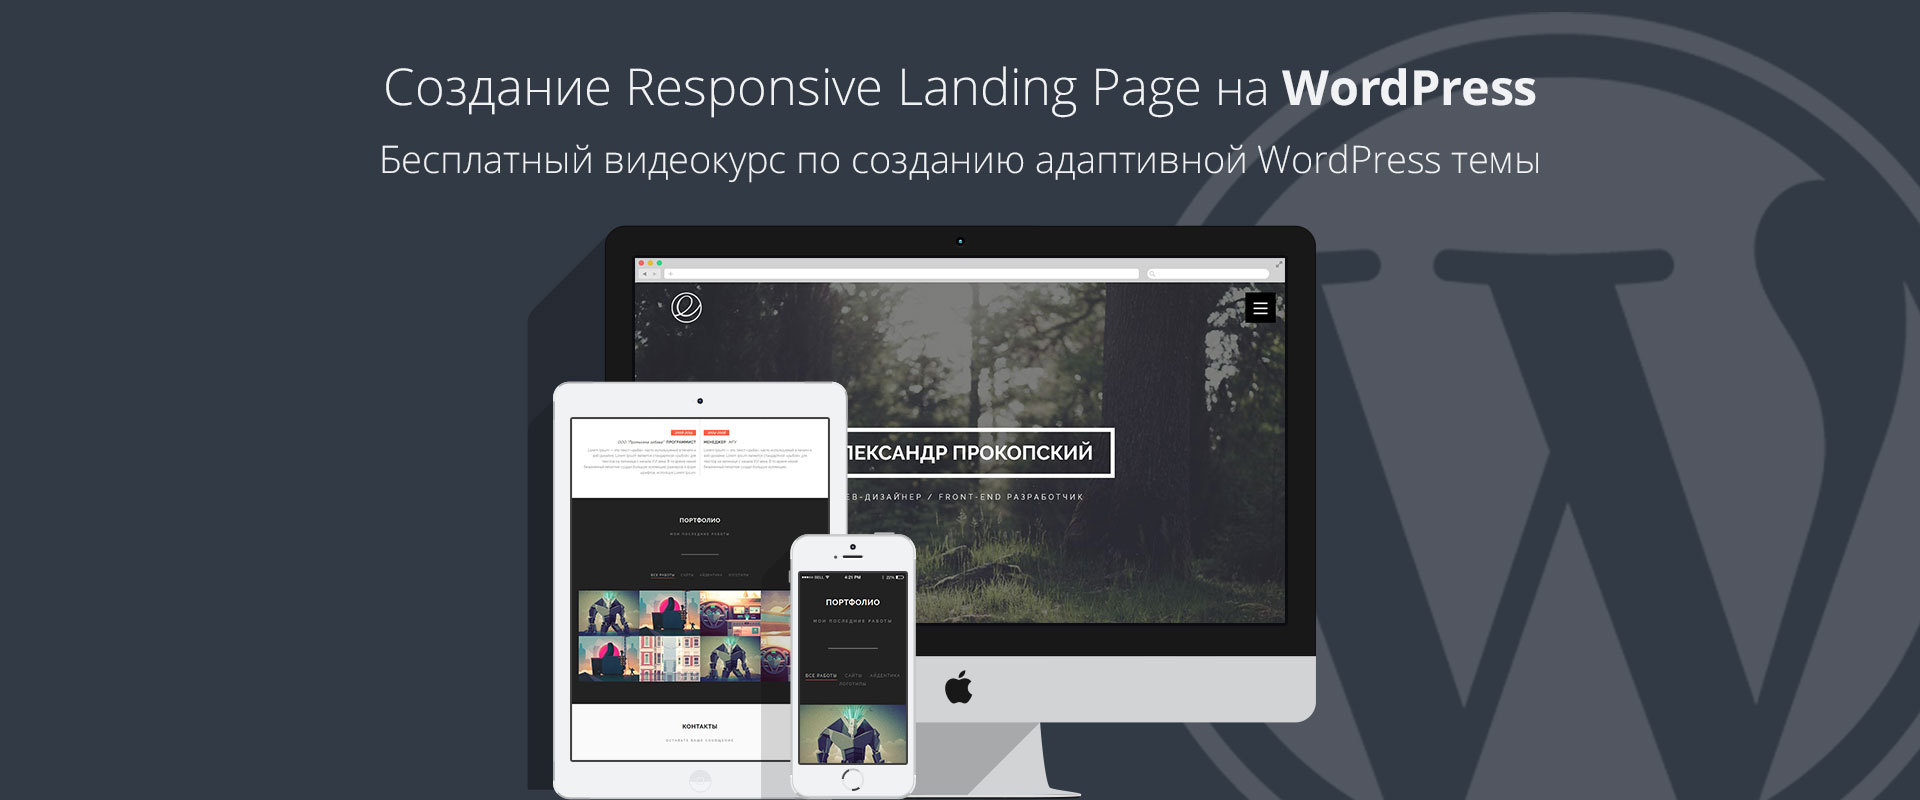 Создание Responsive Landing Page на WordPress от А до Я - 1